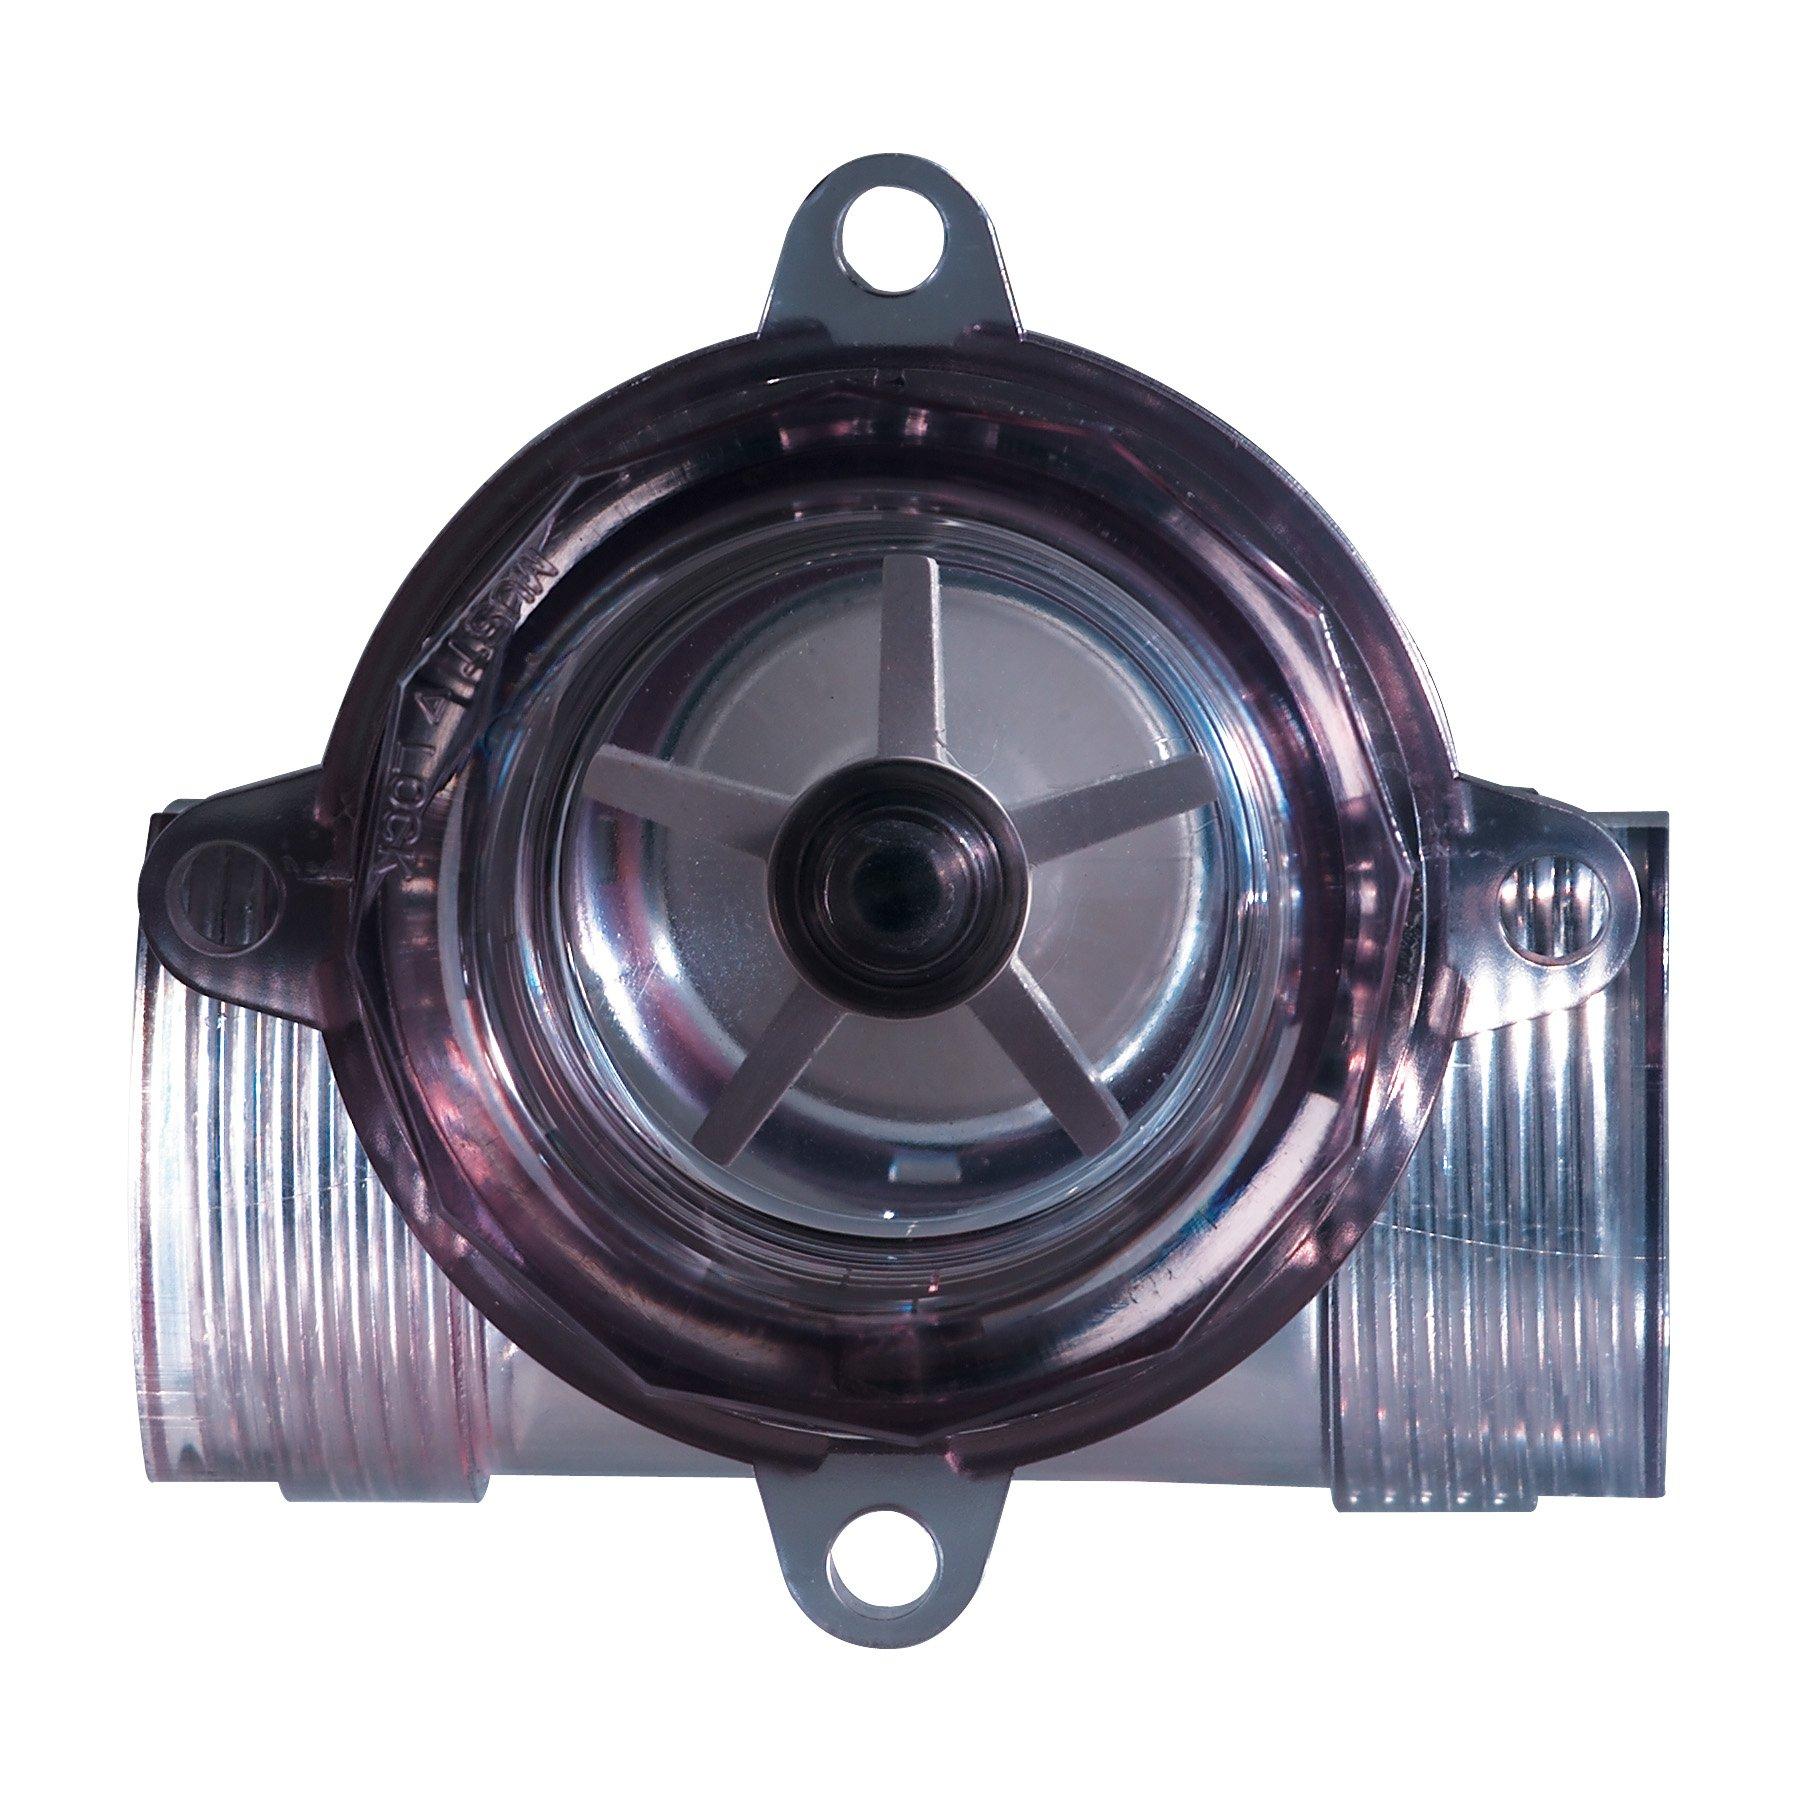 Dwyer W E Anderson Series SFI-800 Sight Flow Indicator, Polysulfone 3/4'' Female NPT Ports, Range 3-35 GPM